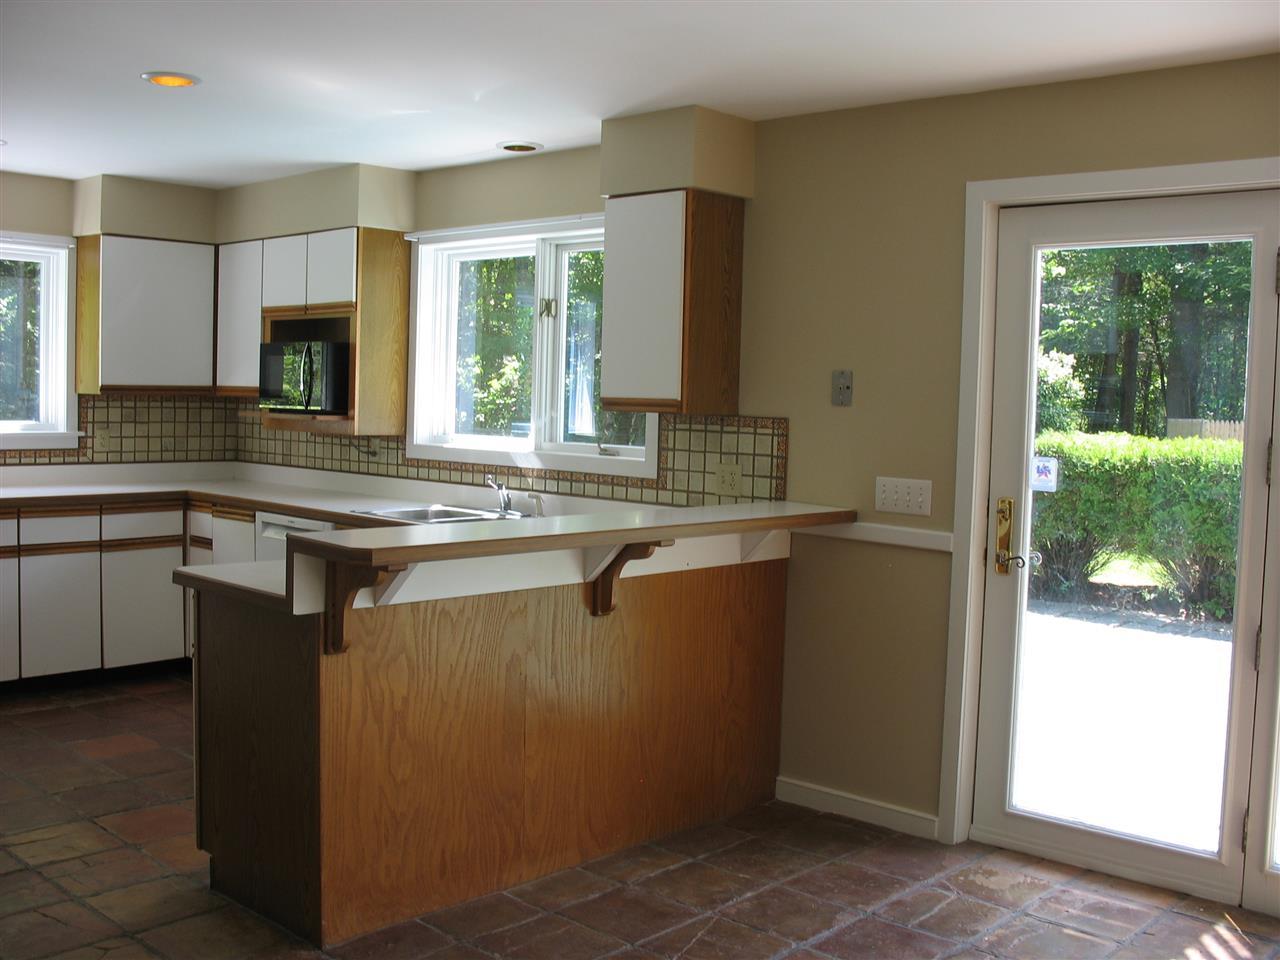 Newly painted kitchen